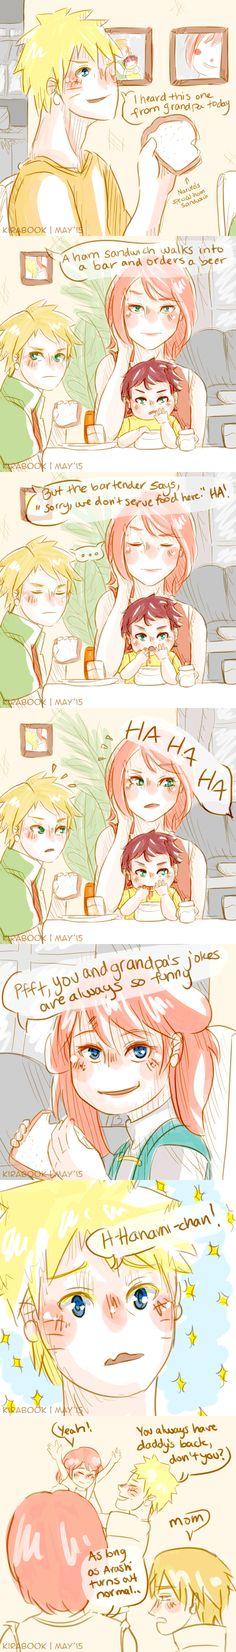 Naruto AU - Dad Jokes by Kirabook